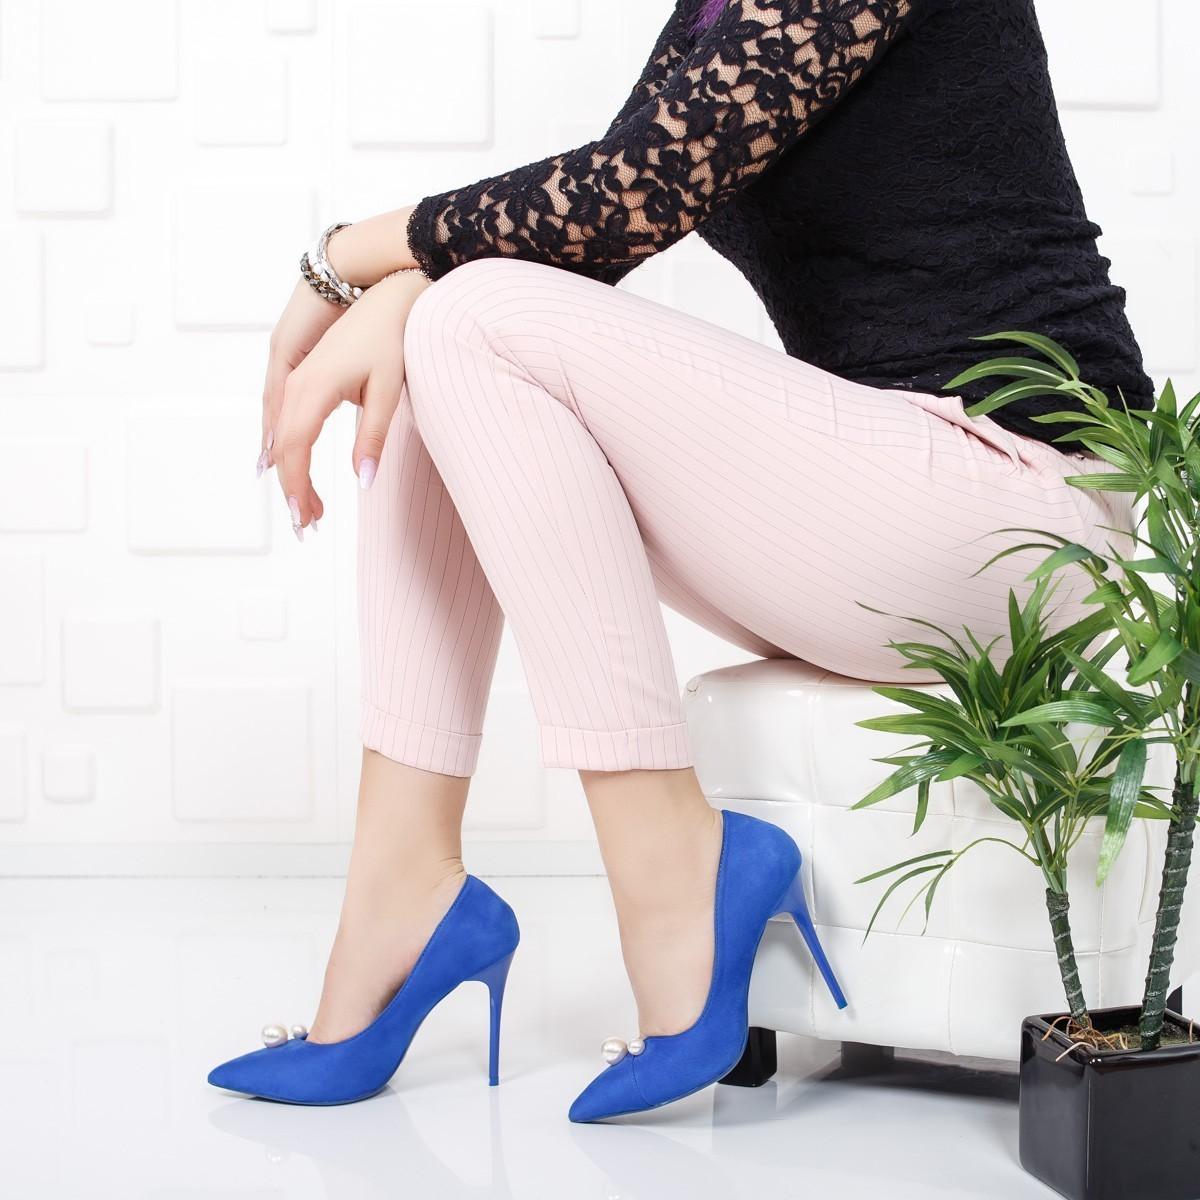 pantofi-dama-rafel-albastri-